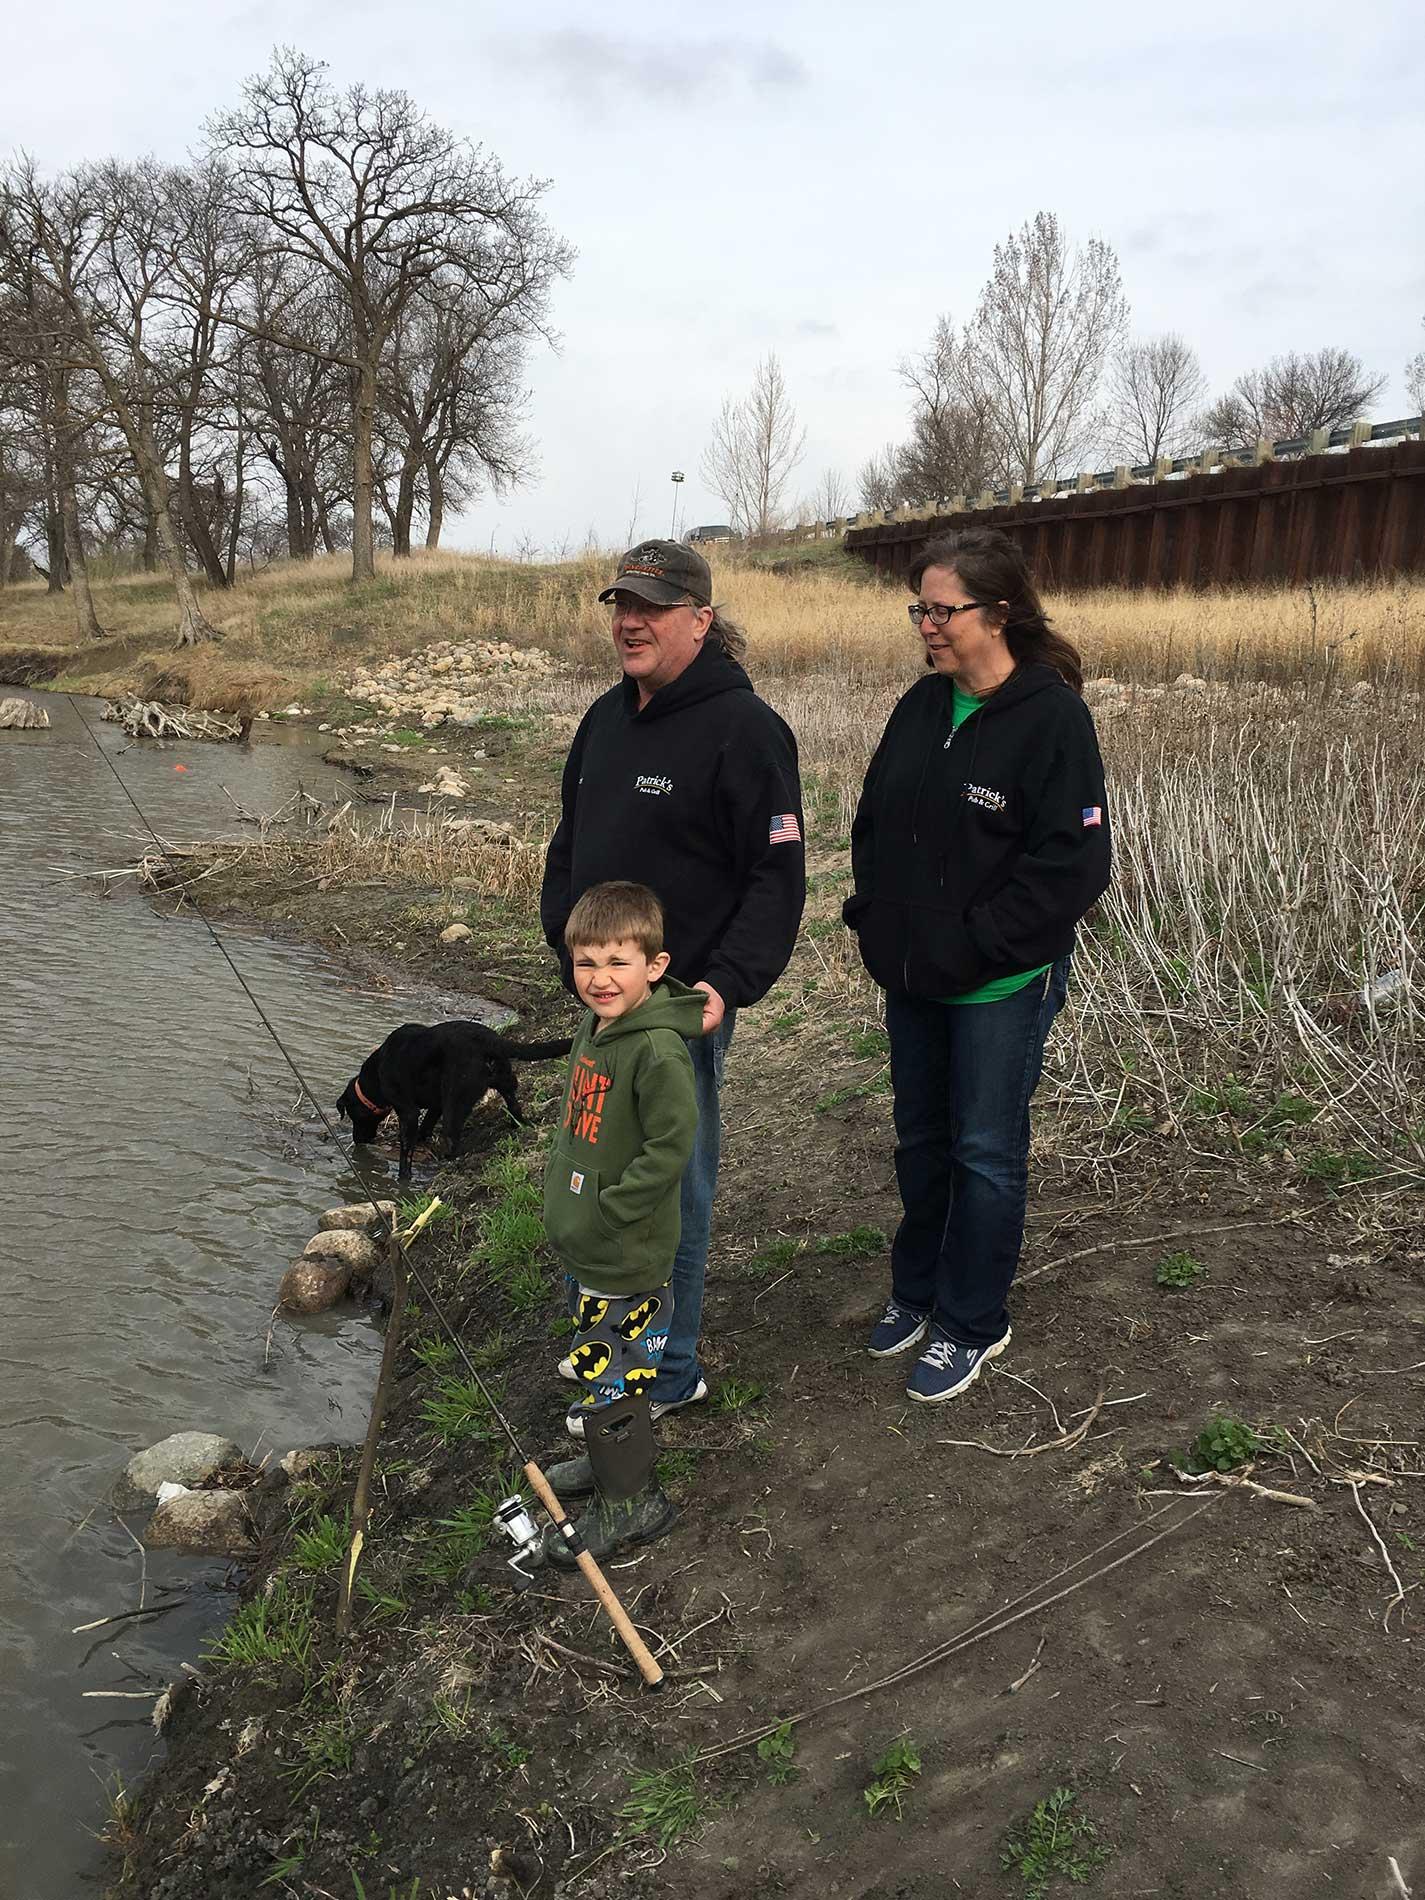 Grandpa and Grandma fishing with Reese